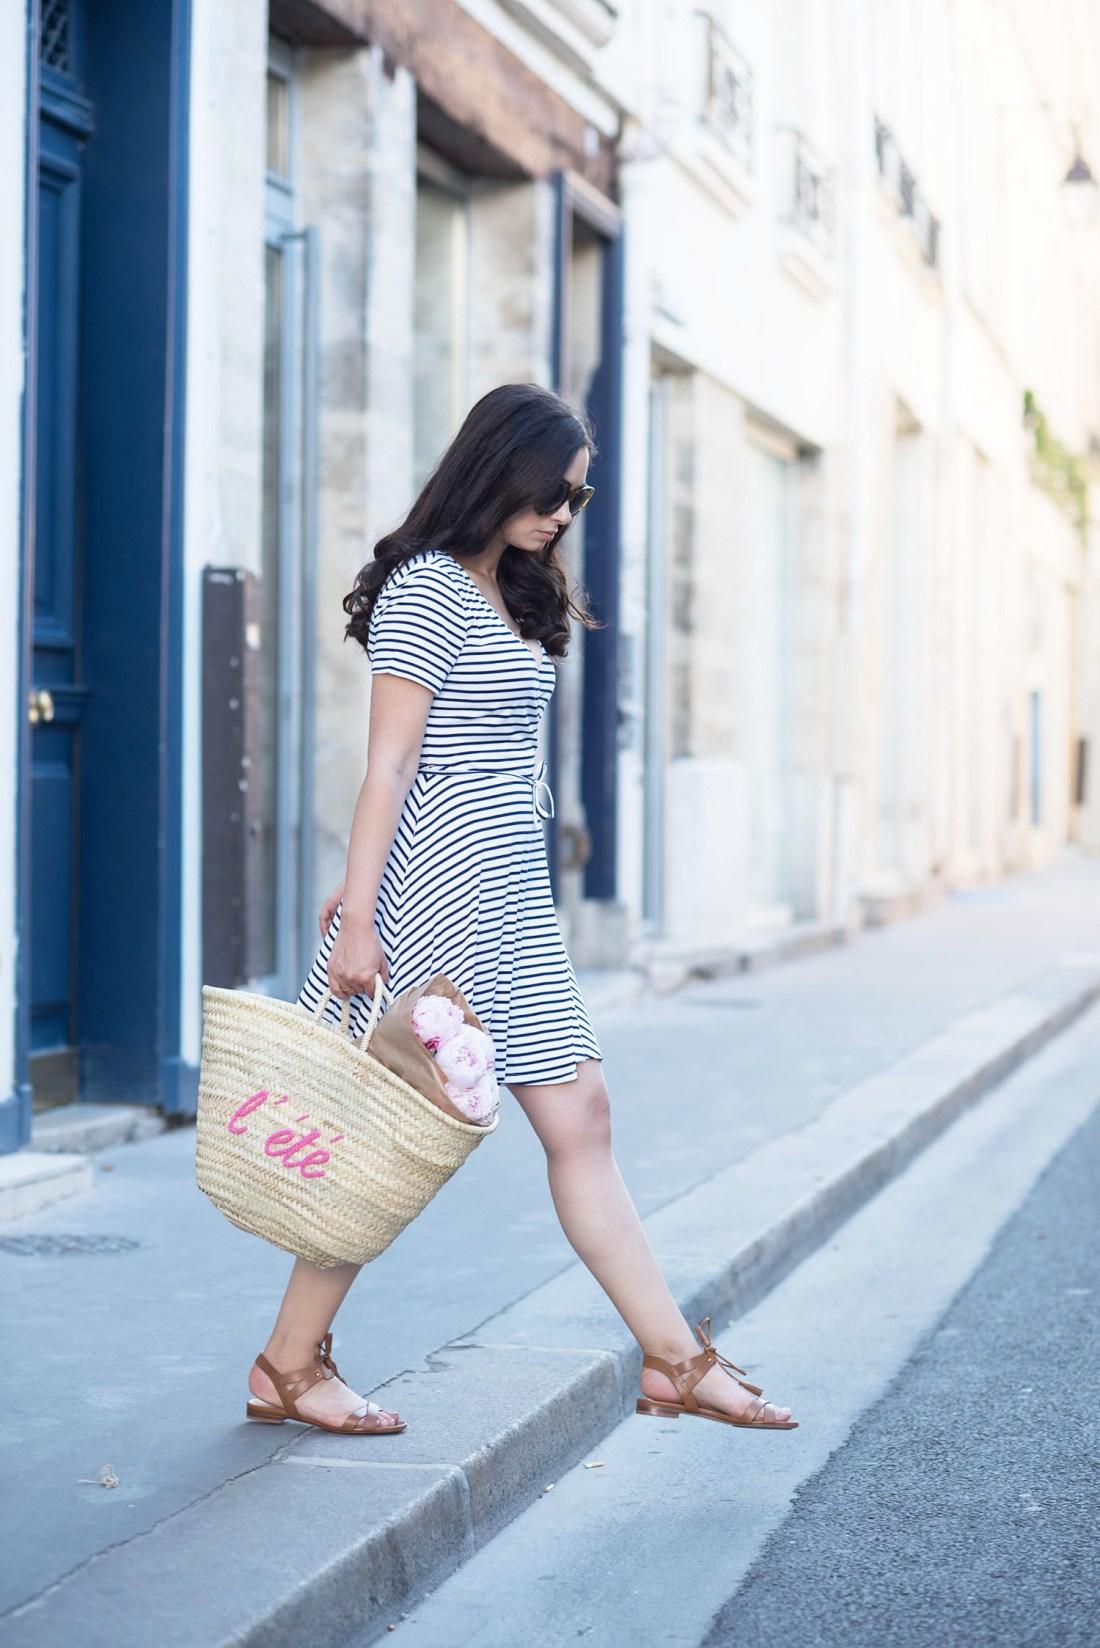 Fashion blogger Cee Fardoe of Coco & Vera walks through le Marais wearing a Lovers & Friends striped dress